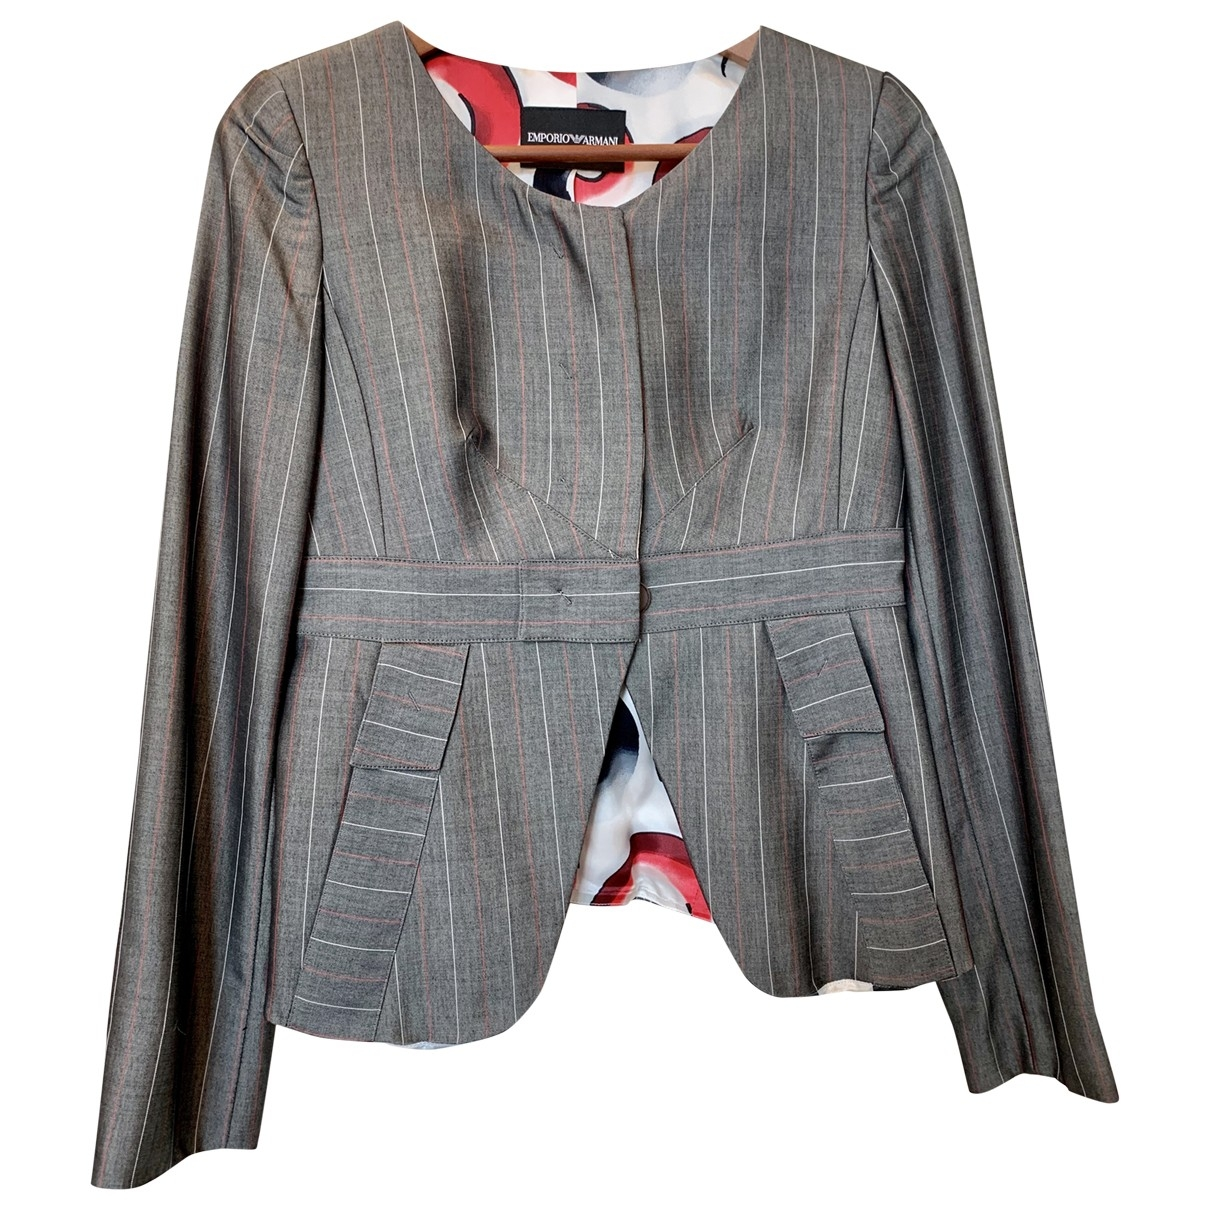 Emporio Armani \N Grey jacket for Women 40 IT